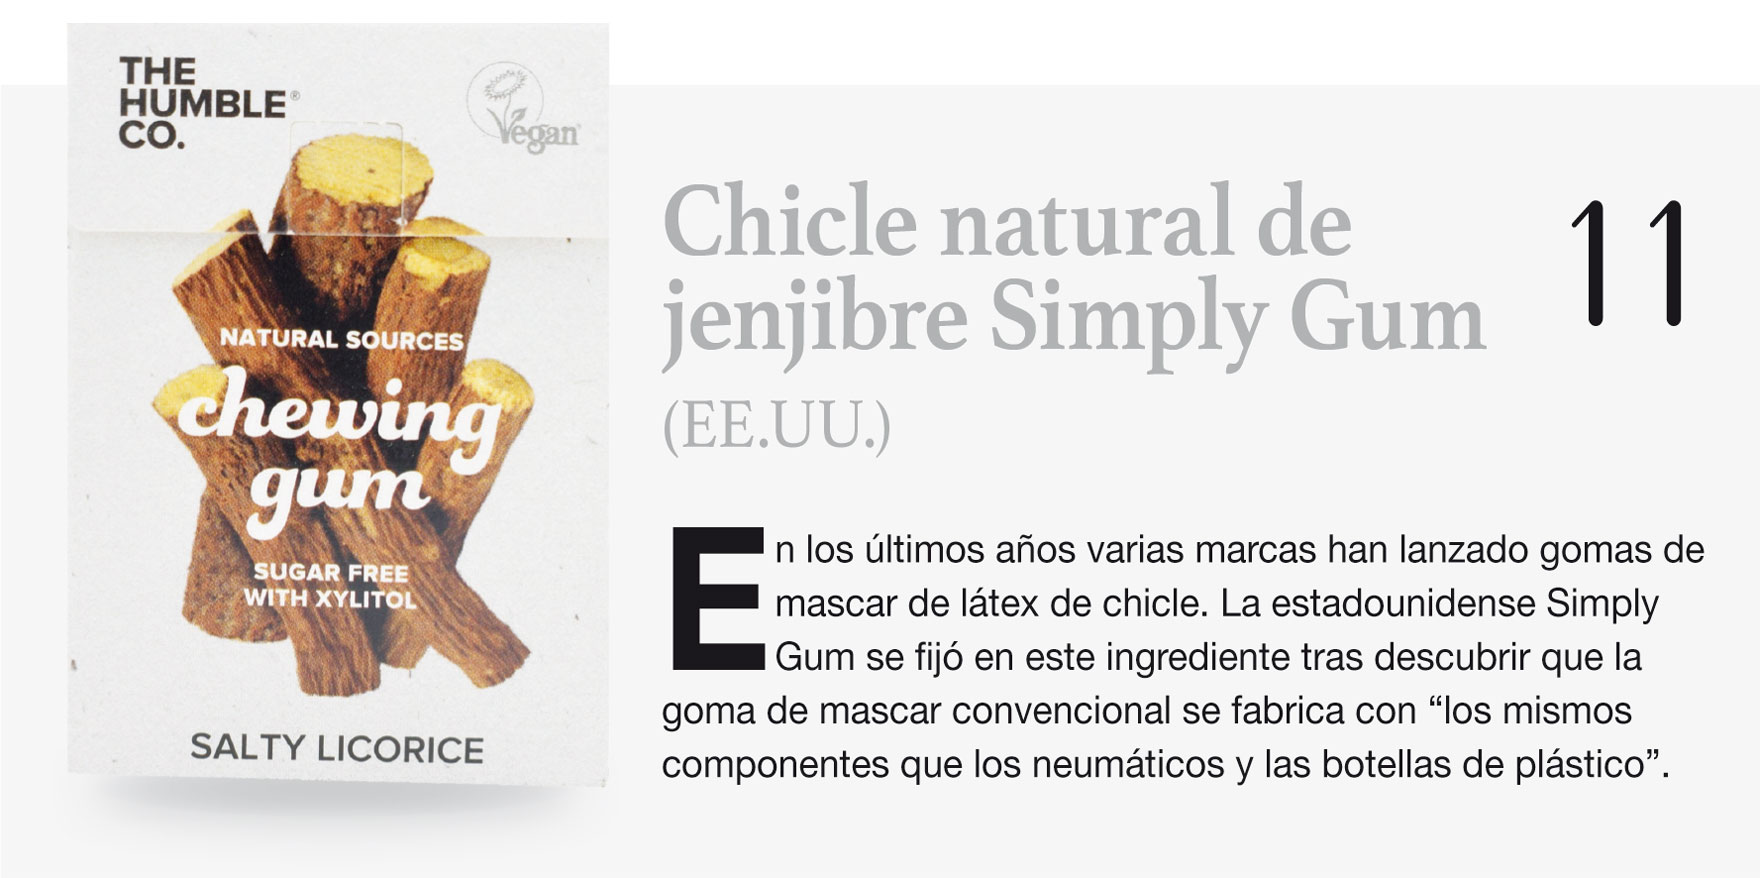 Chicle natural de jenjibre Simply Gum (EE.UU.)